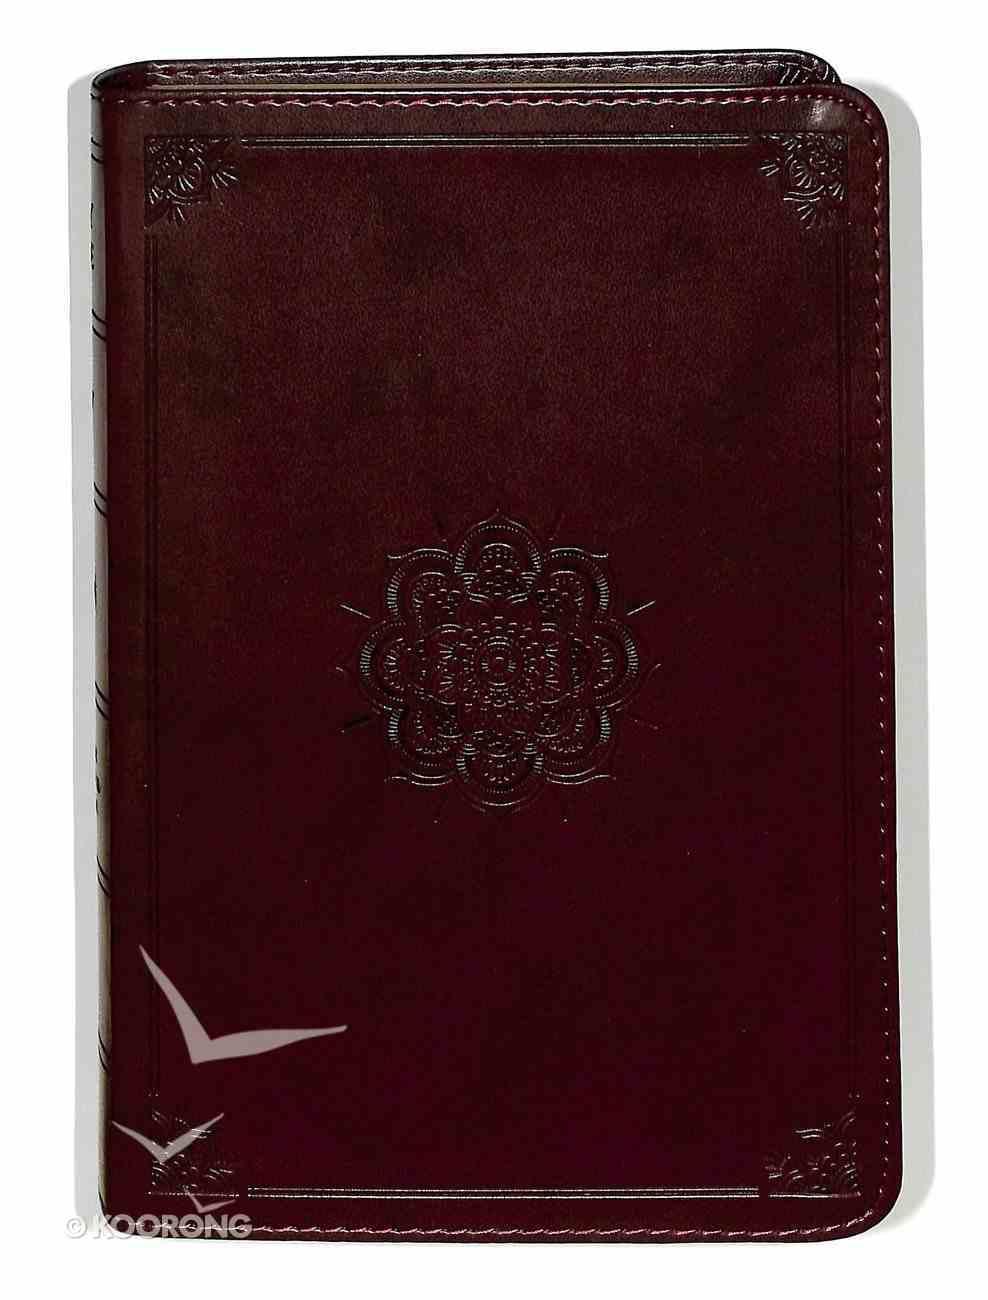 ESV Personal Reference Bible Trutone Mahogany Emblem Design Imitation Leather